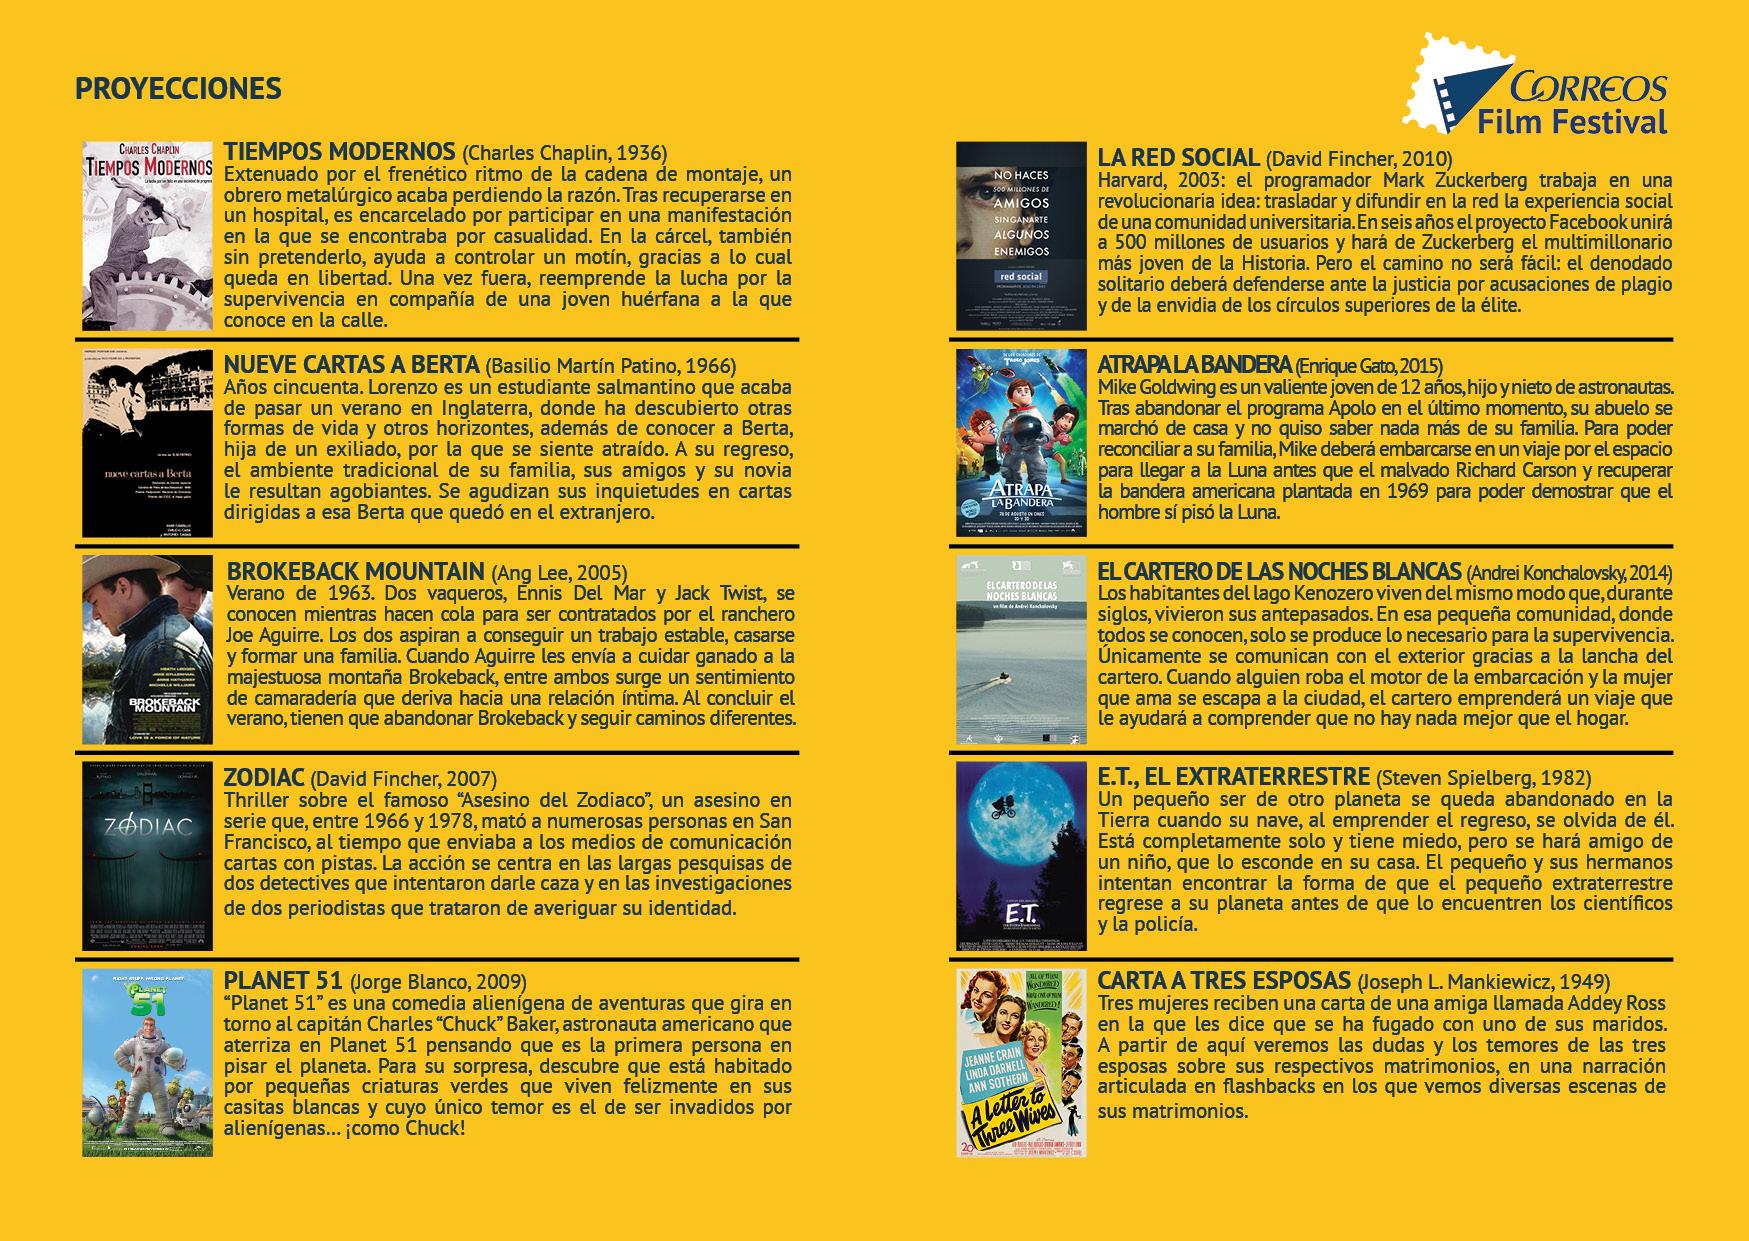 Peliculas Correos film festival